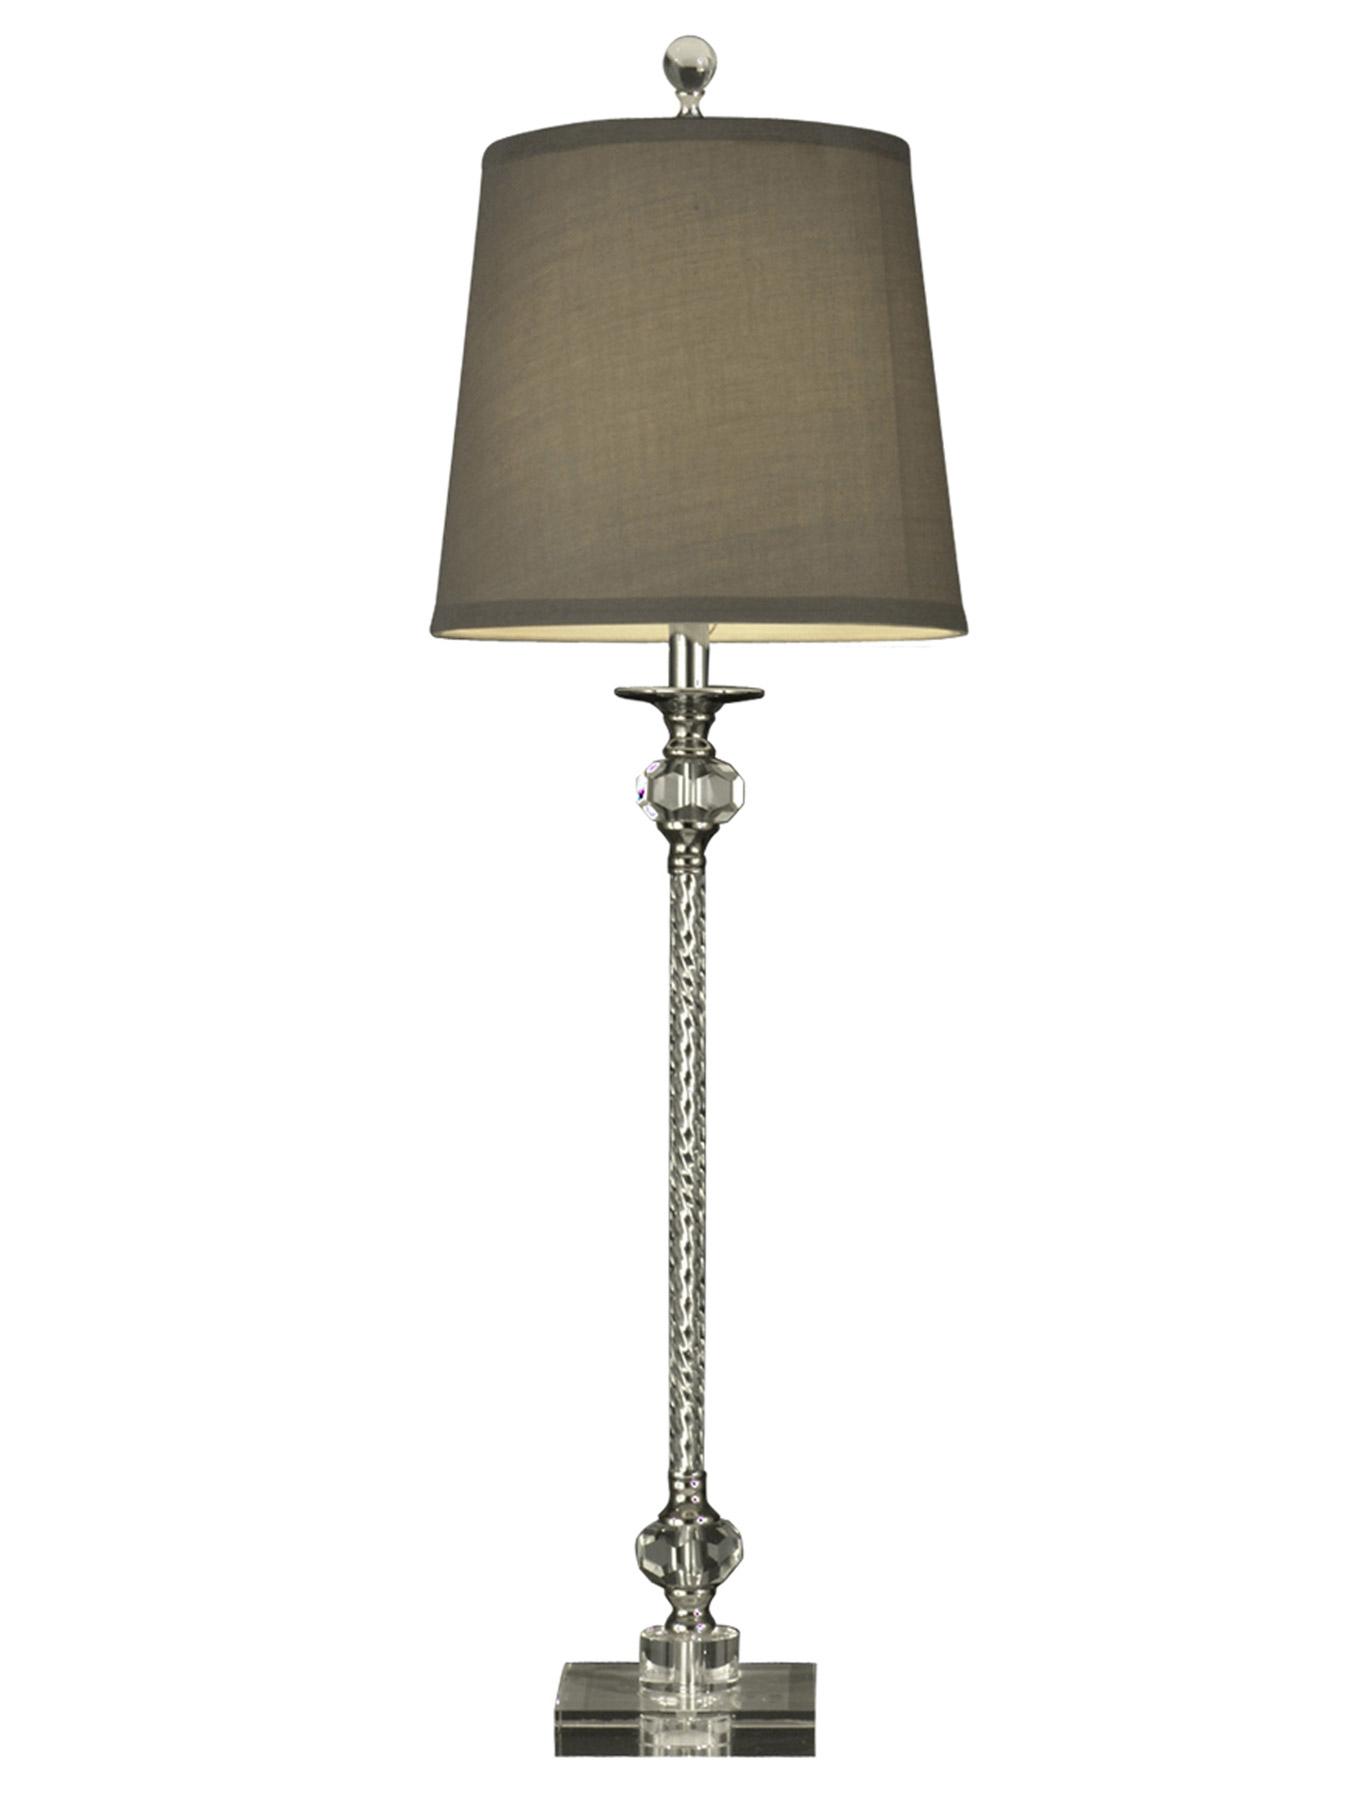 dale tiffany gb12002 crystal allister buffet lamp. Black Bedroom Furniture Sets. Home Design Ideas